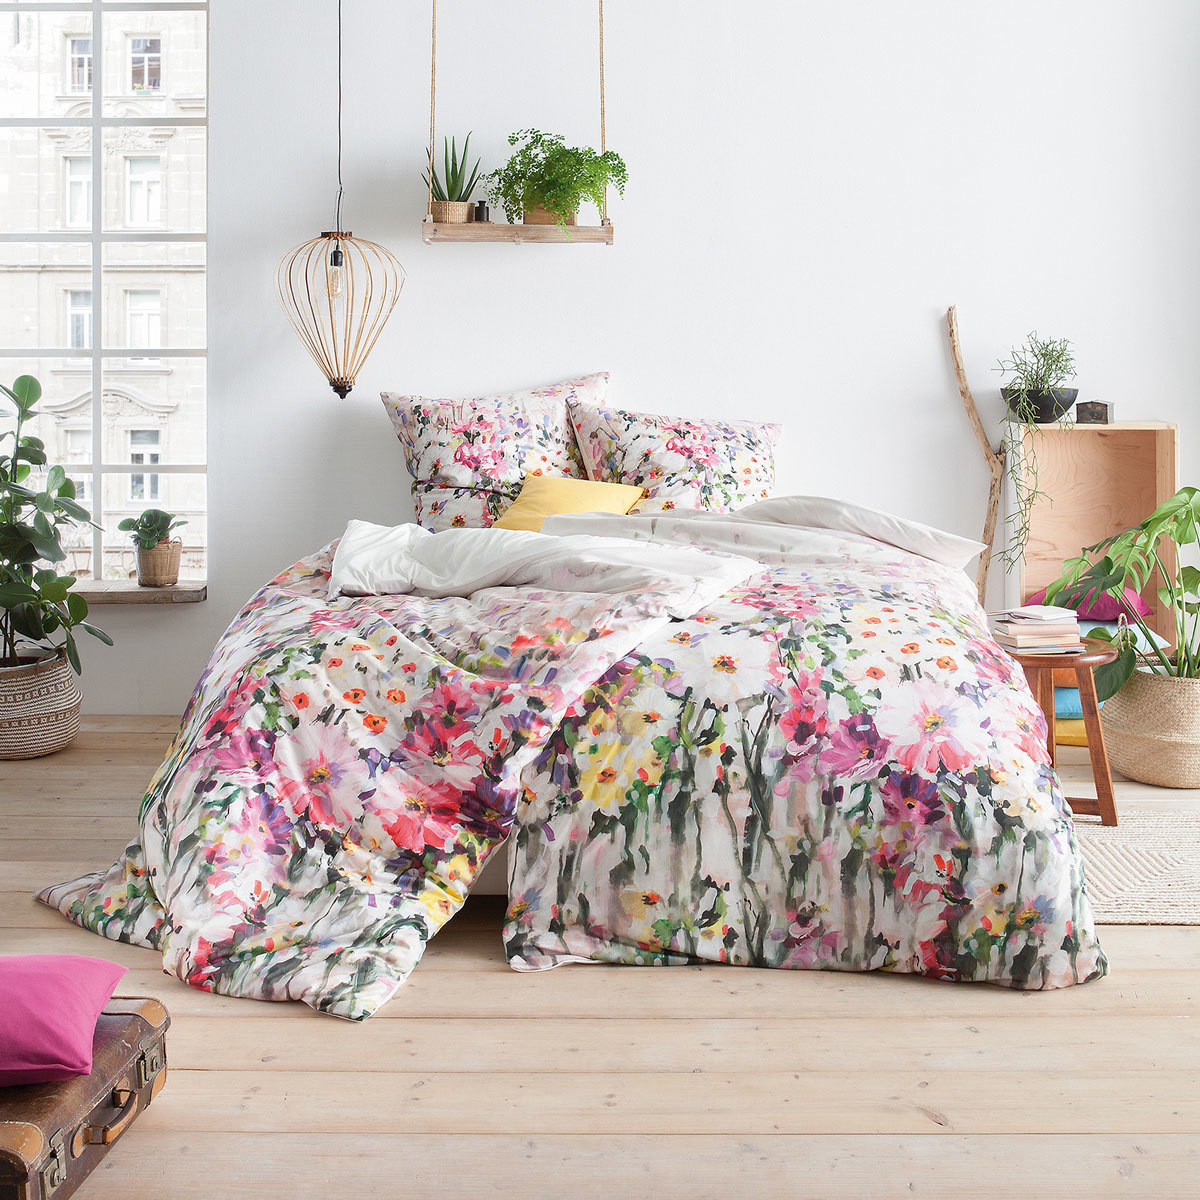 estella mako interlock jersey bettw sche vera lavendel. Black Bedroom Furniture Sets. Home Design Ideas